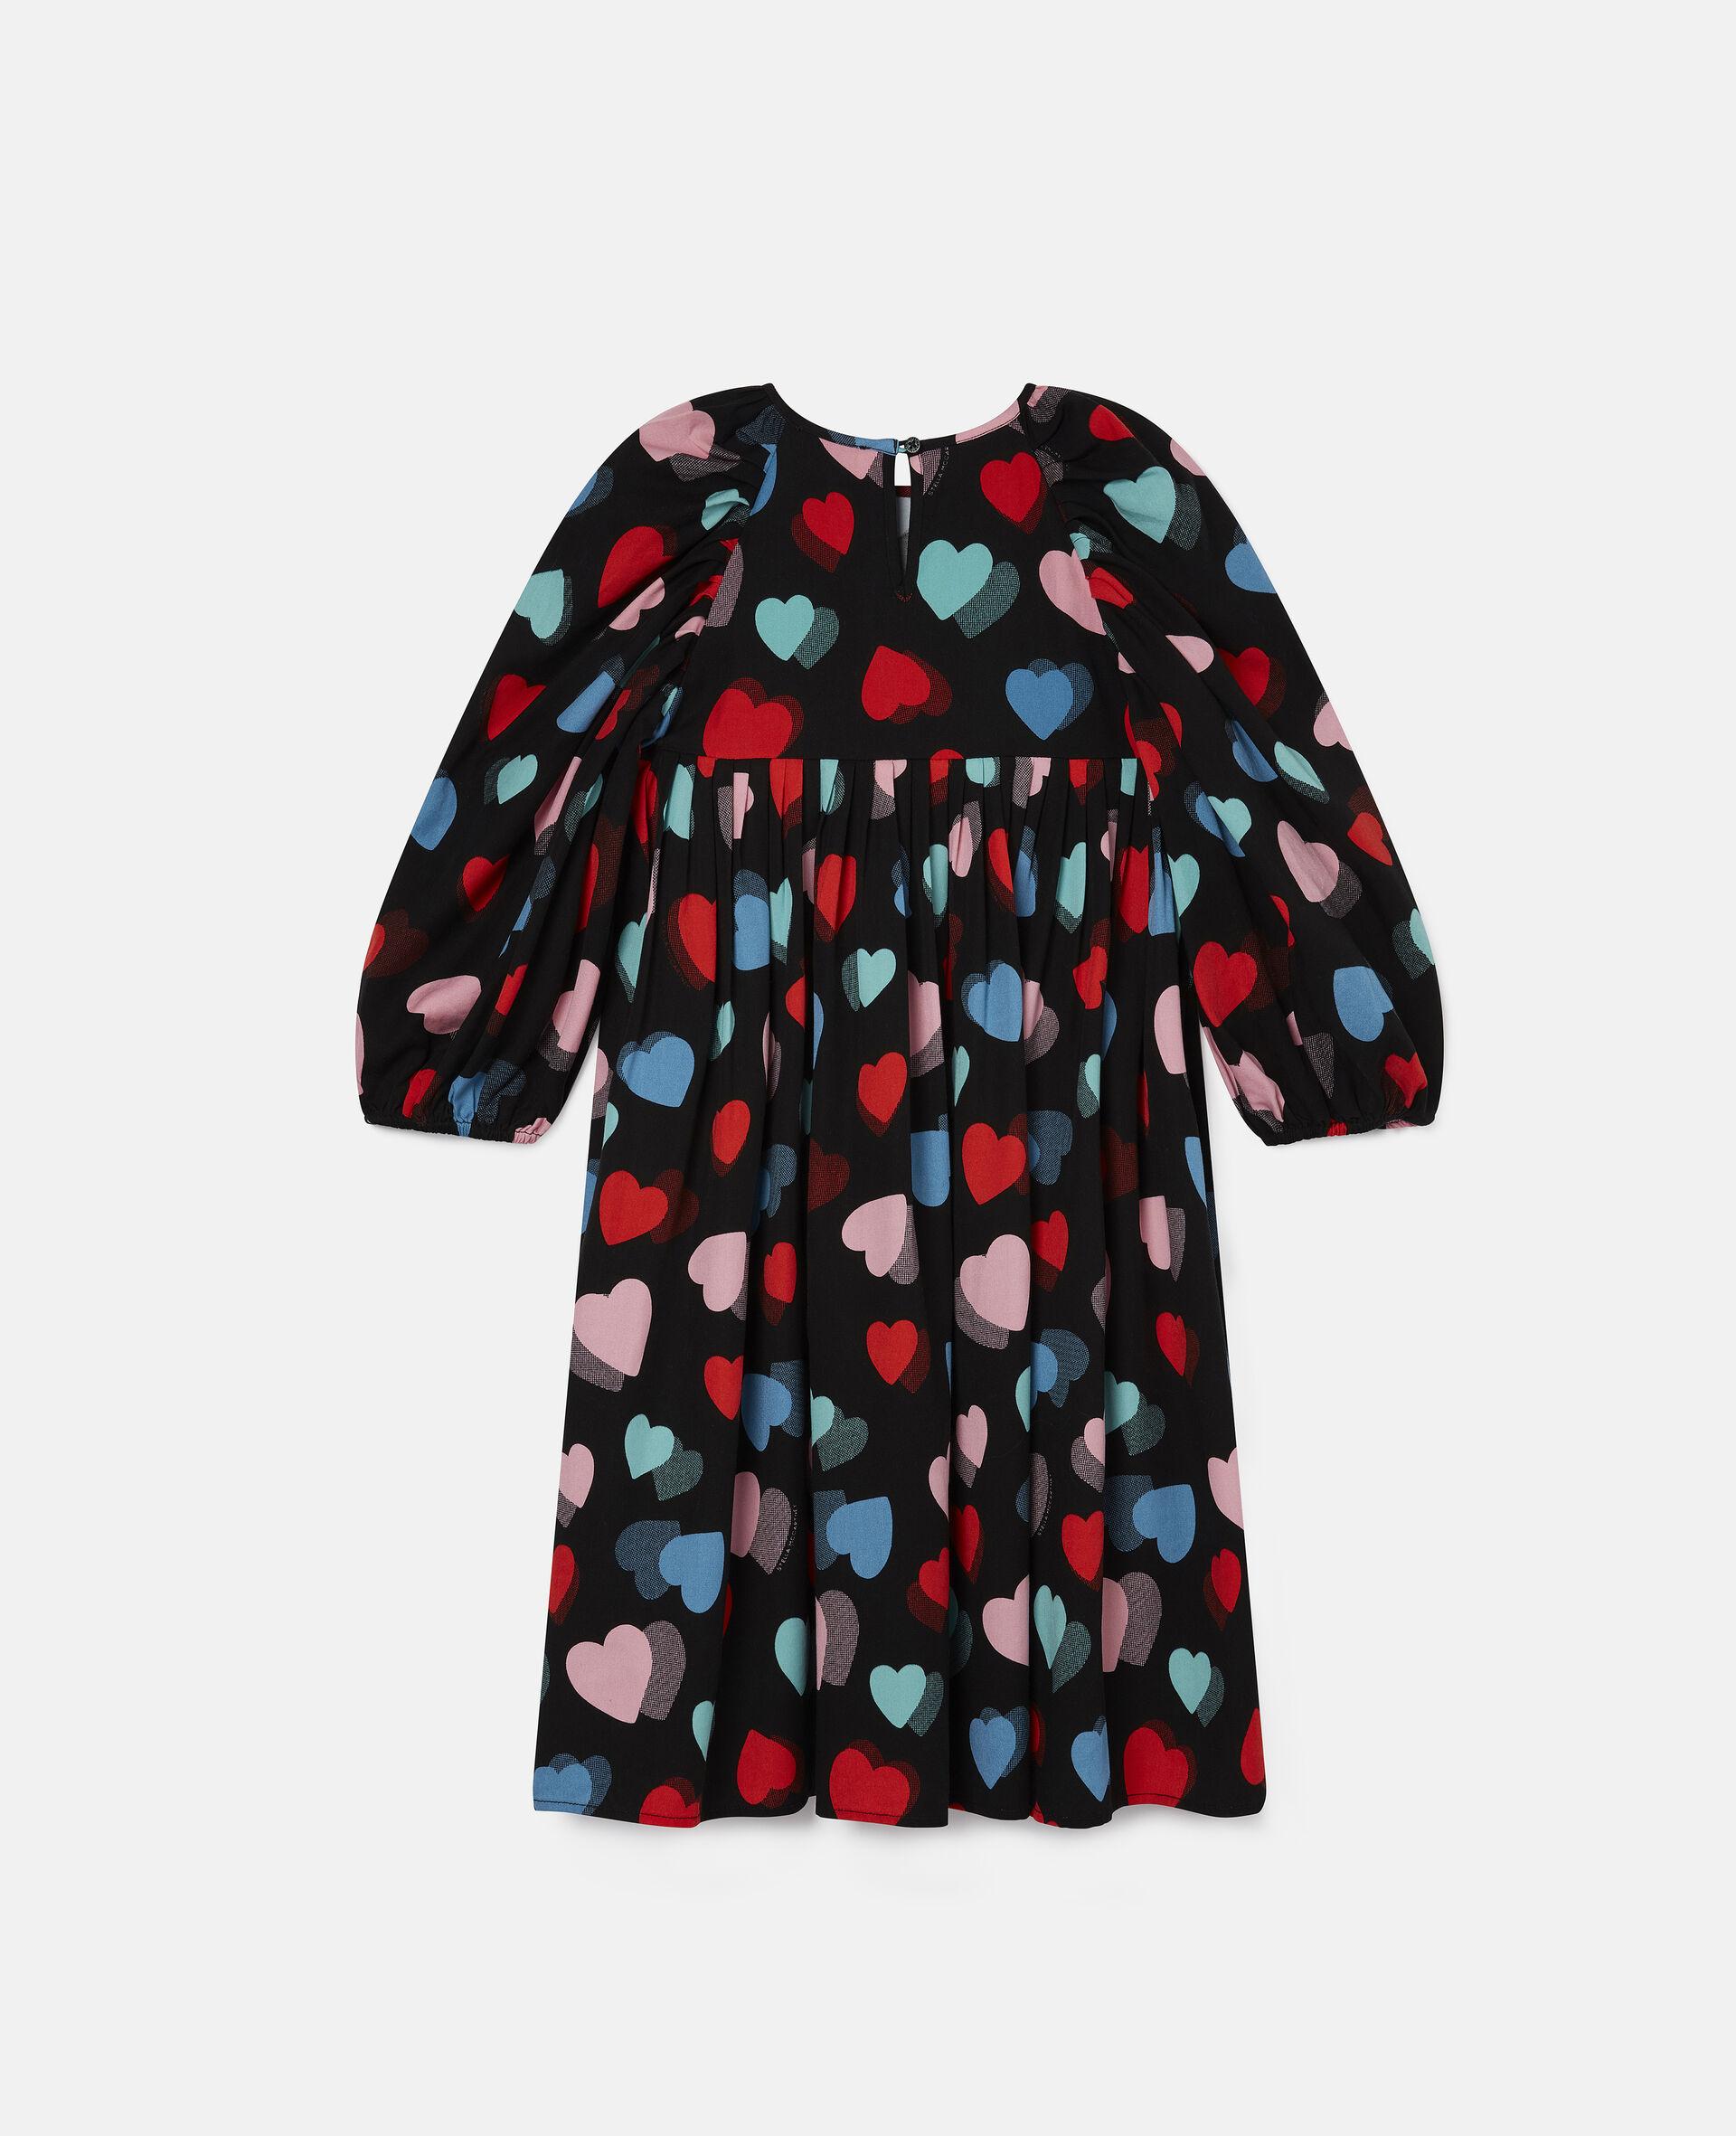 Kleid aus Tencel-Twill mit Herzen-Print-Bunt-large image number 3